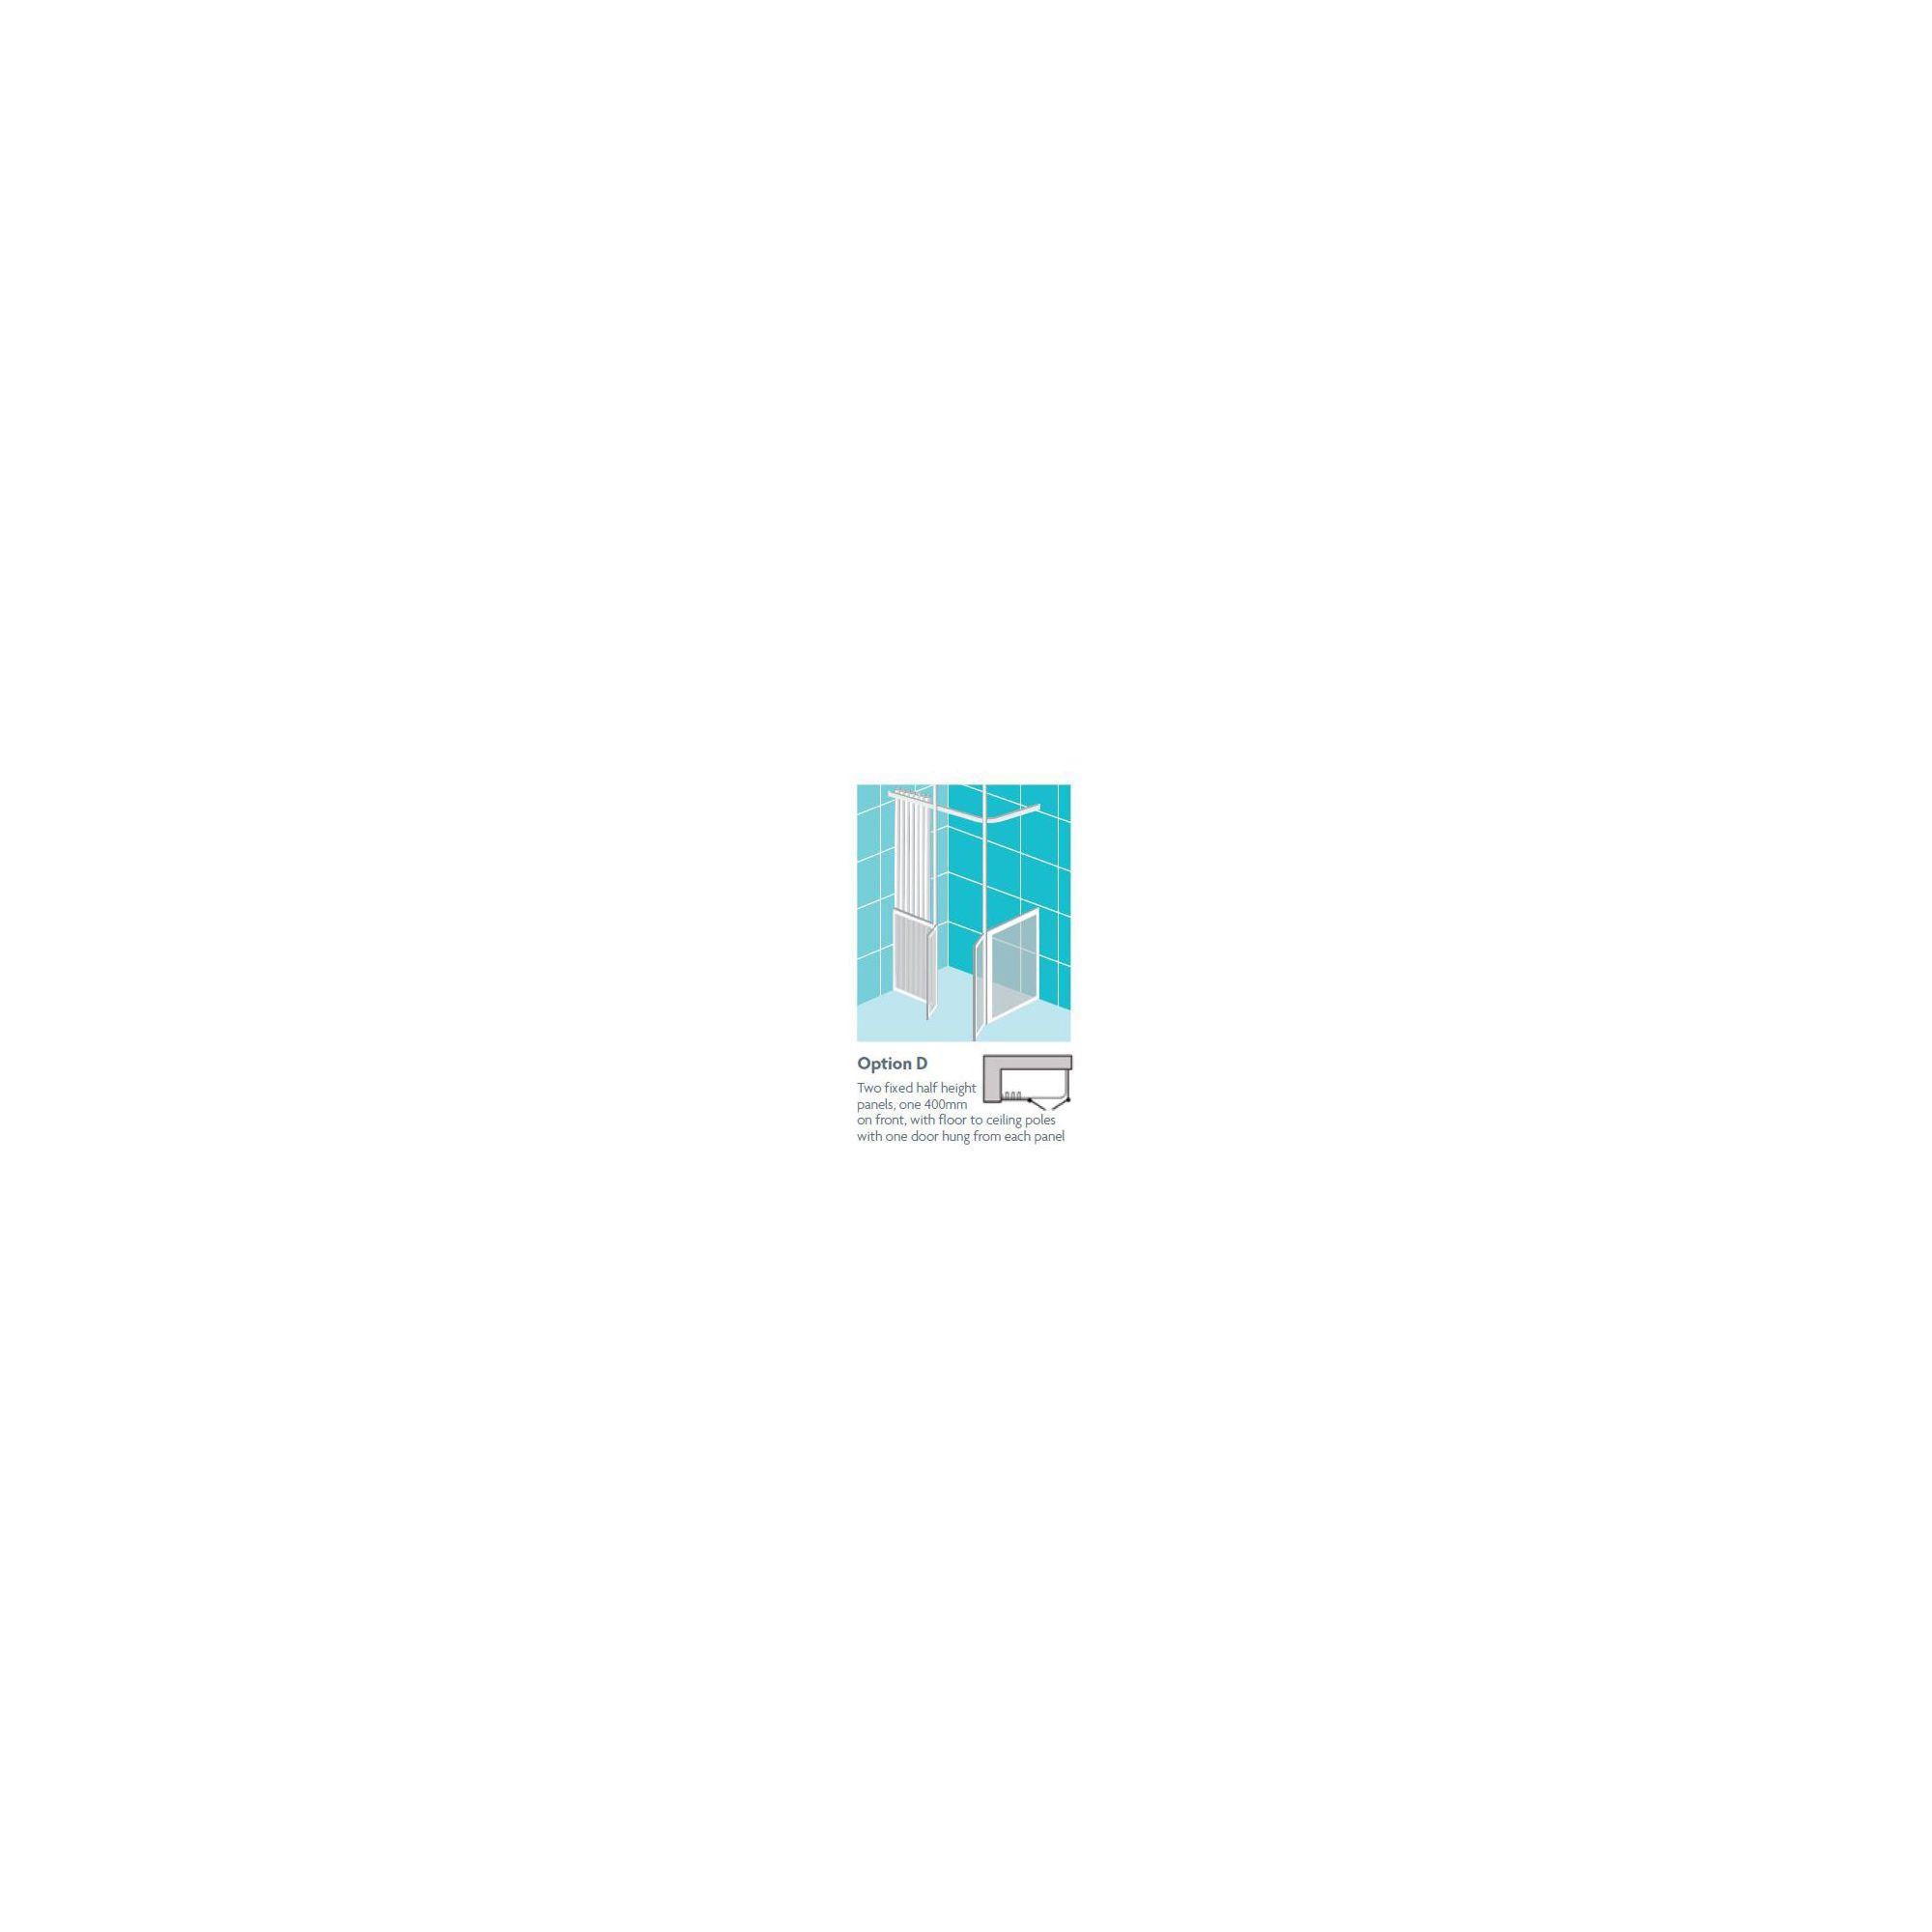 Impey Supreme Corner Door Option D Left Hand 1200mm x 750mm at Tescos Direct